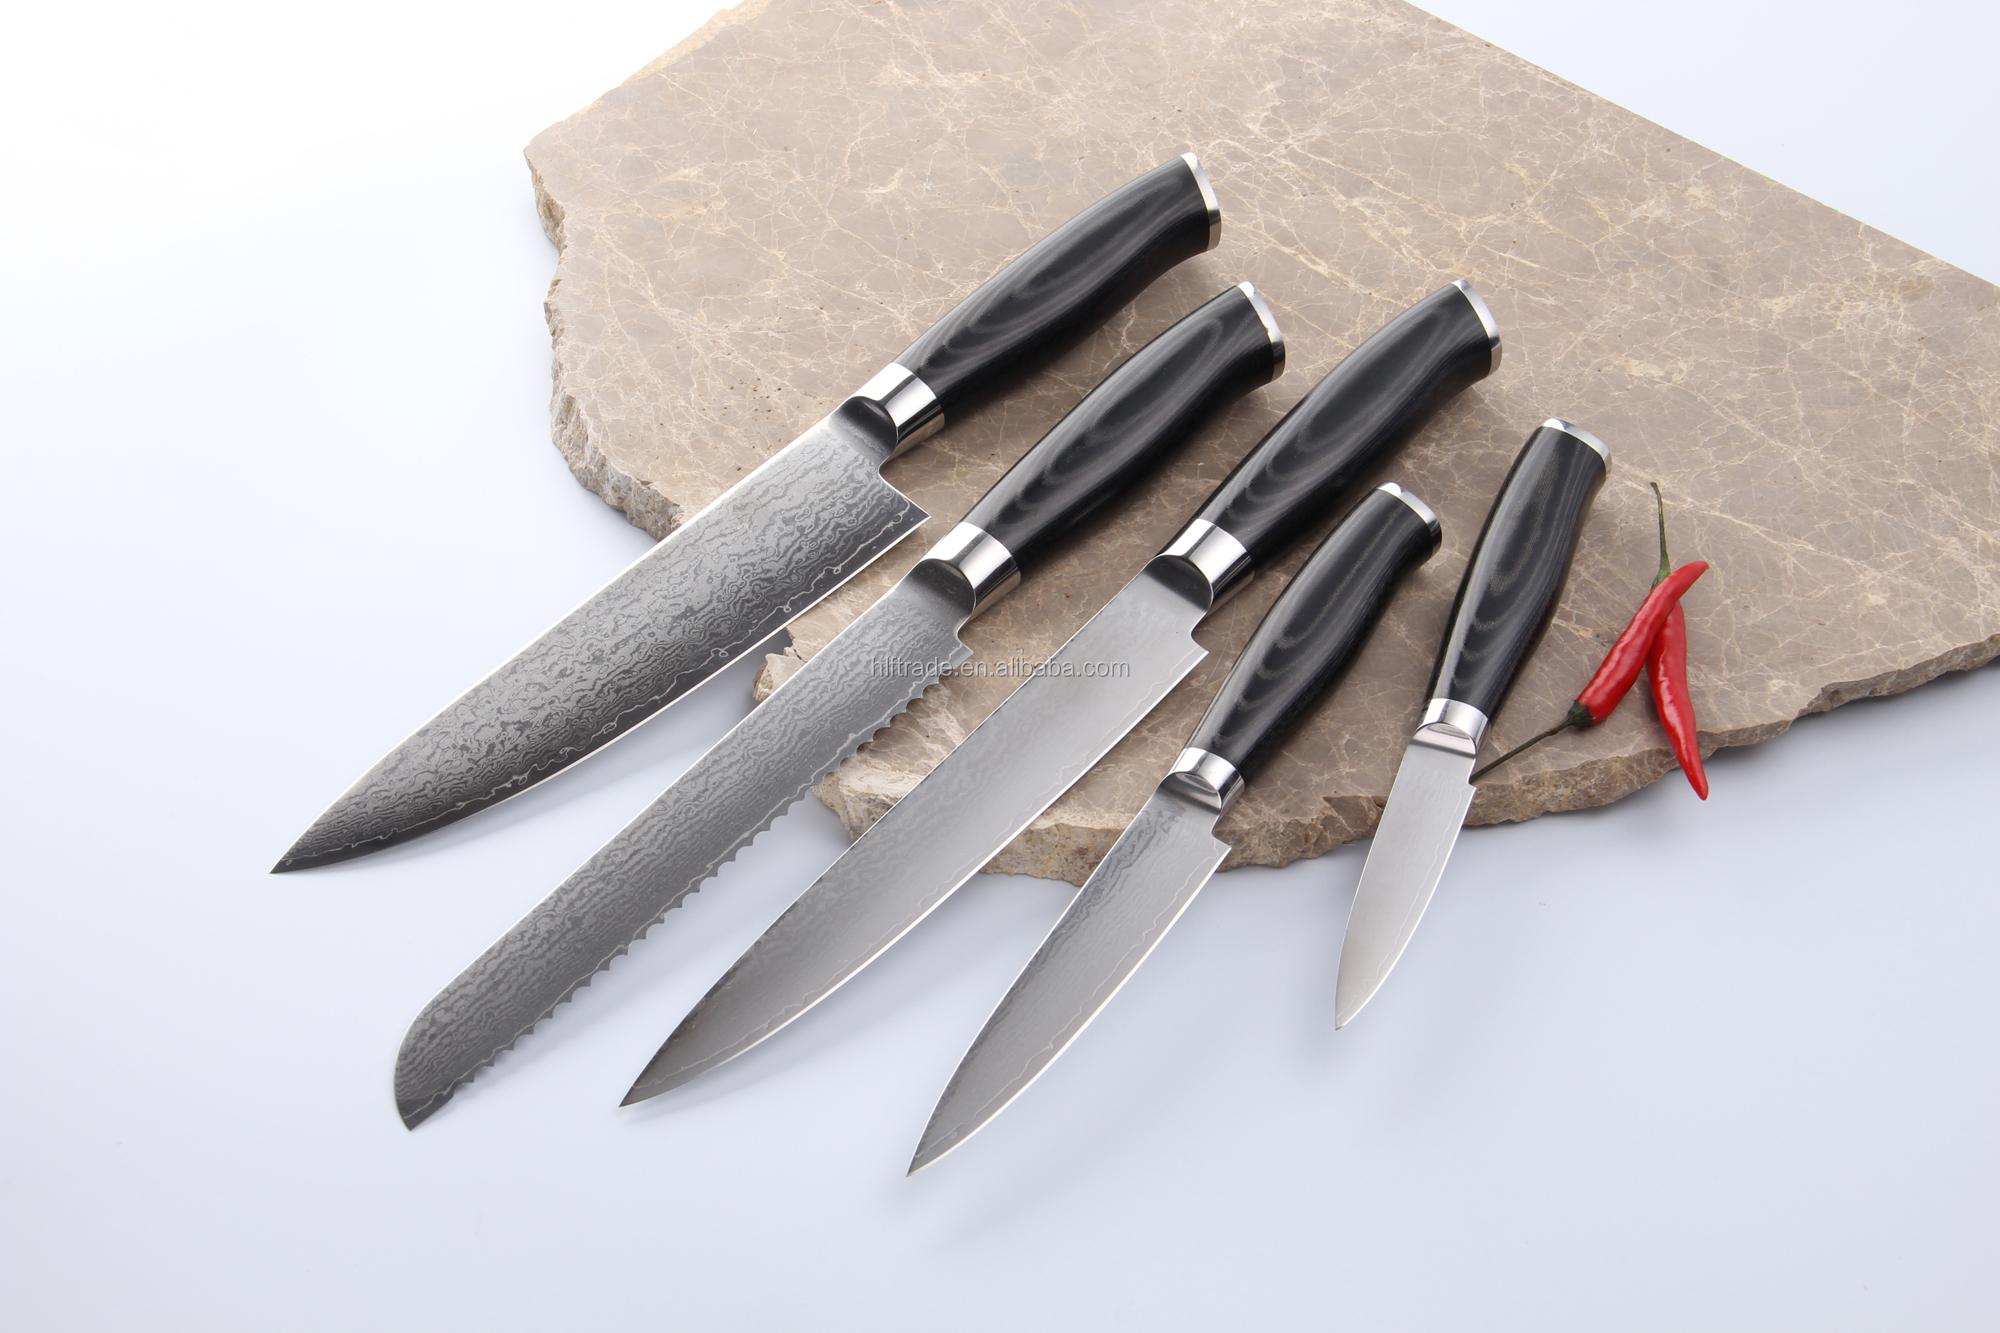 Dp9201 8 Inch Vg10 Damascus Chef Knife Kitchen Knife Set